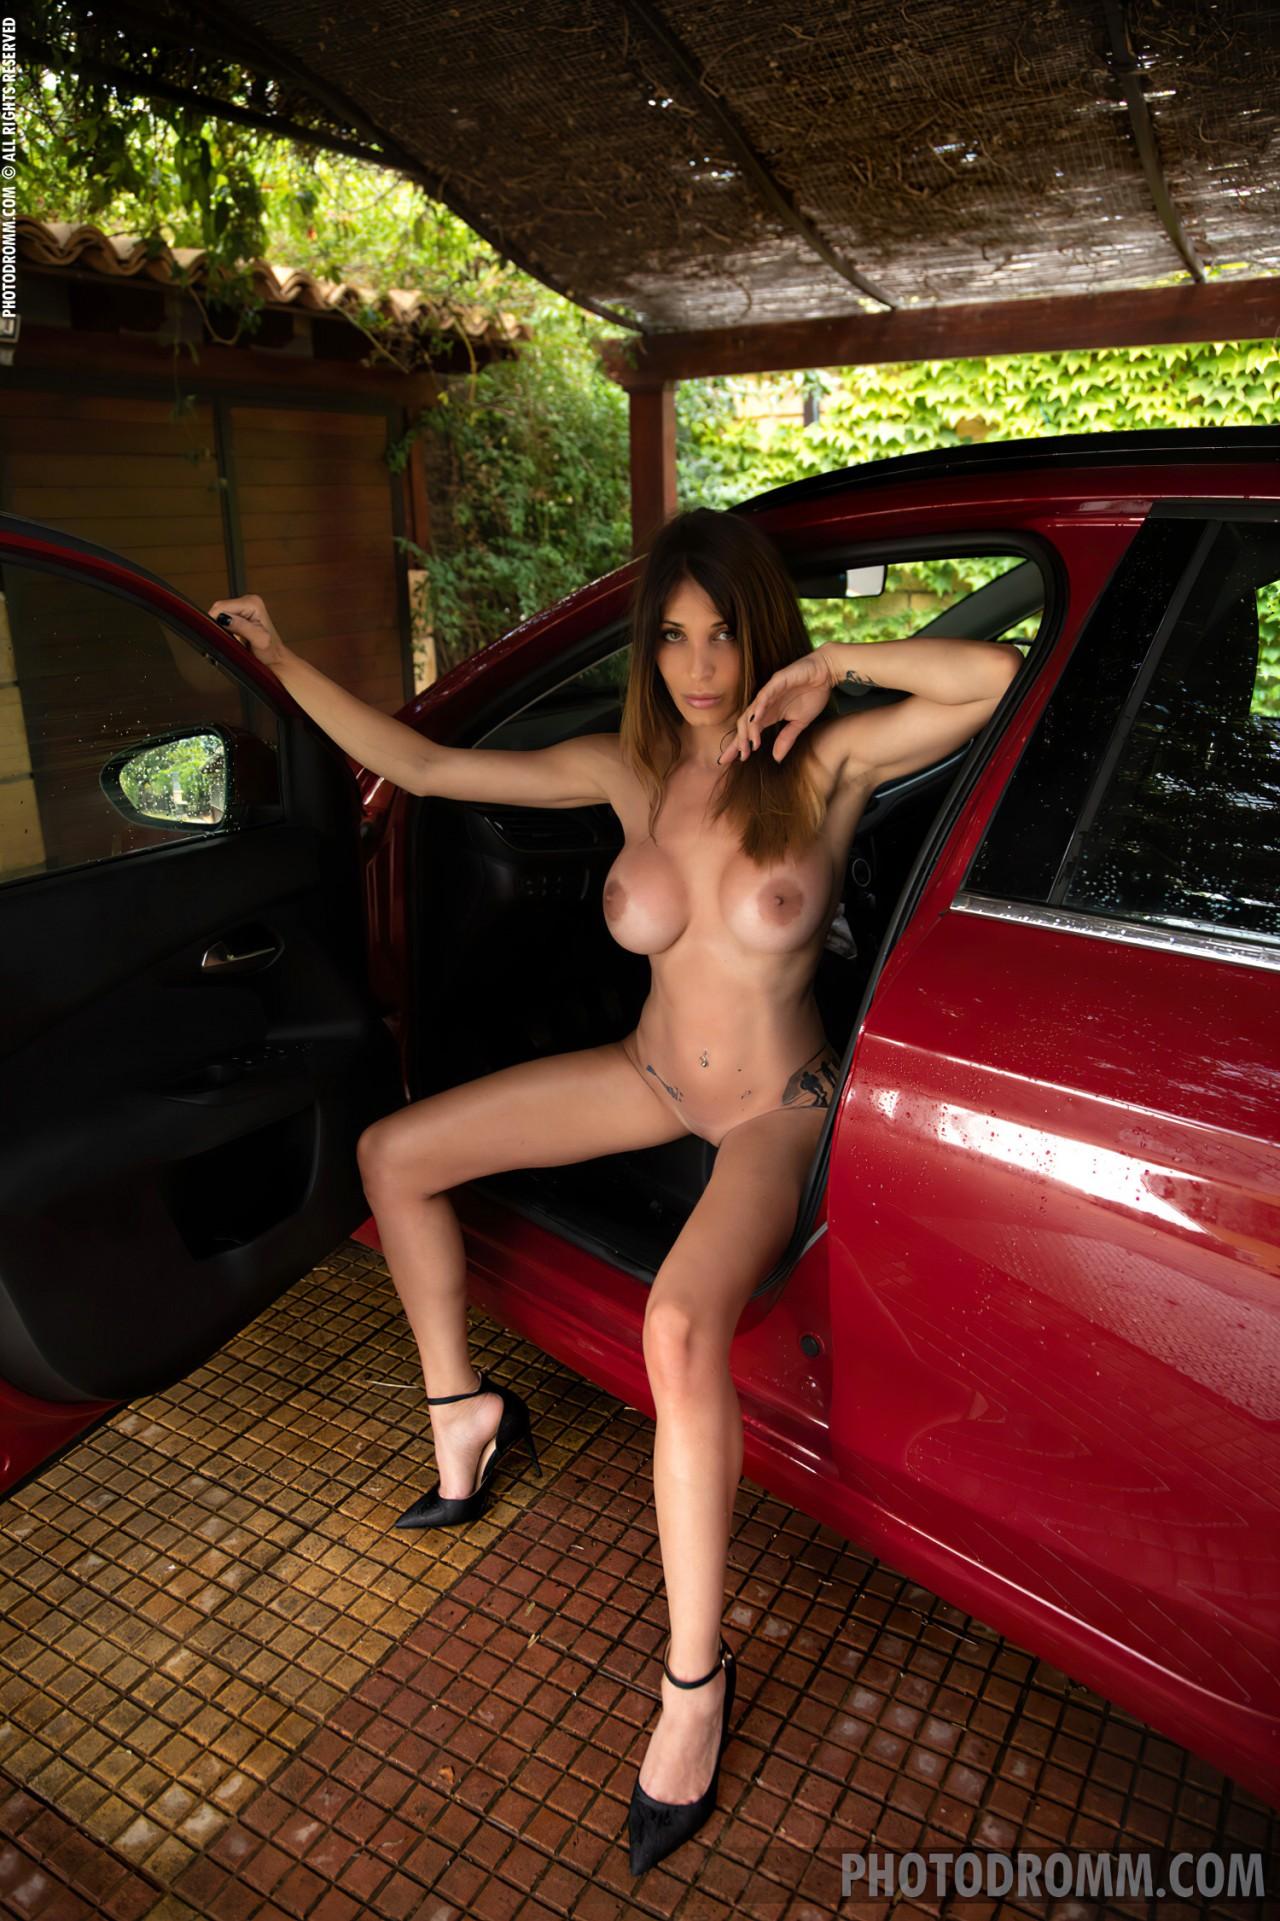 Mulher Lavando Carro Nua (12)